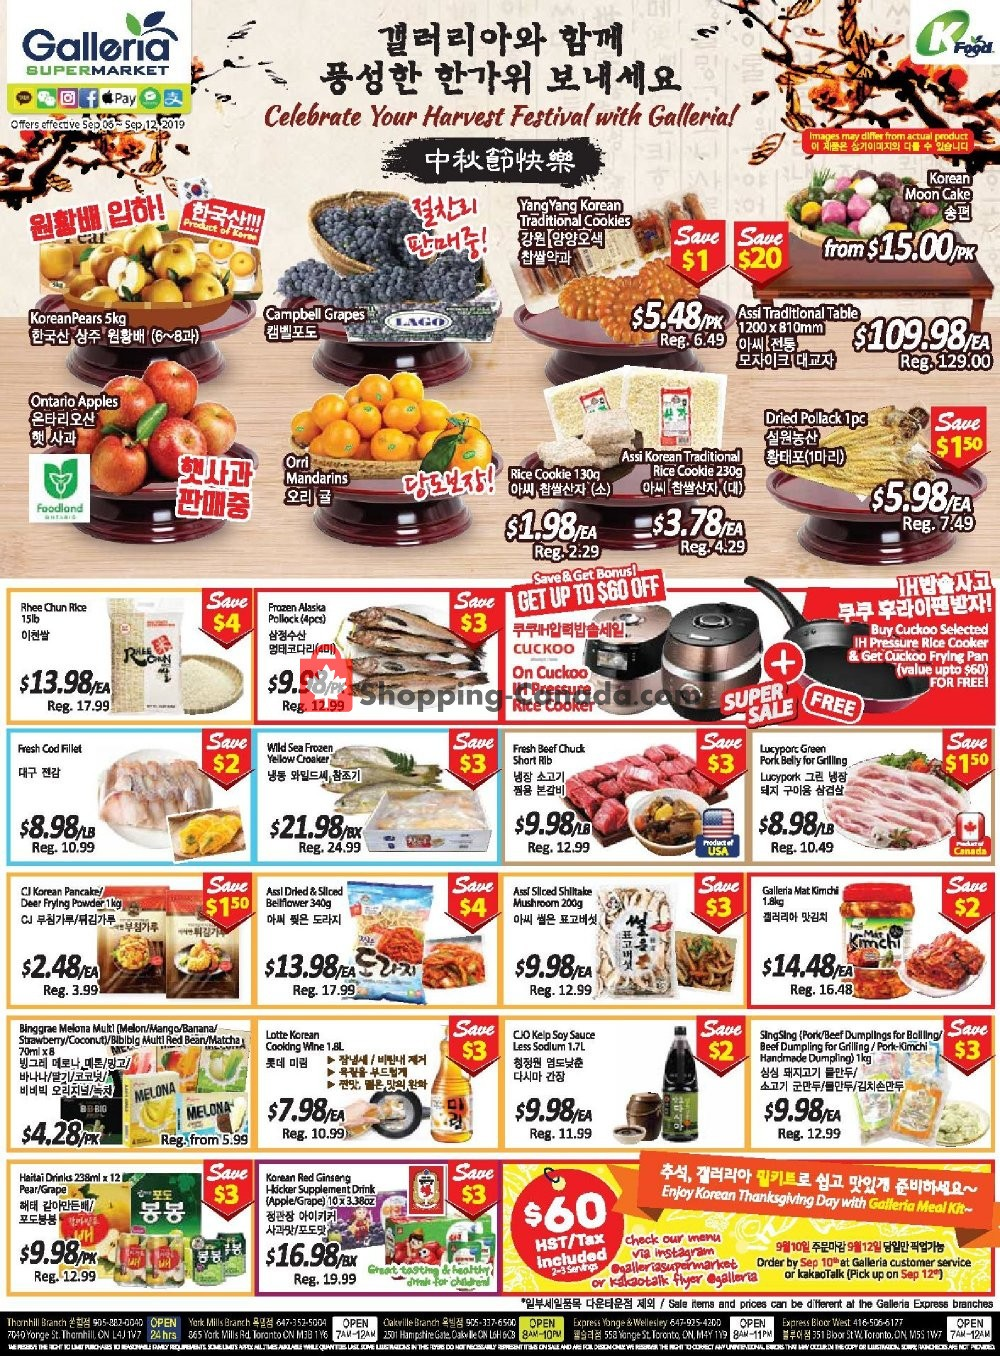 Flyer Galleria Supermarket Canada - from Friday September 6, 2019 to Thursday September 12, 2019